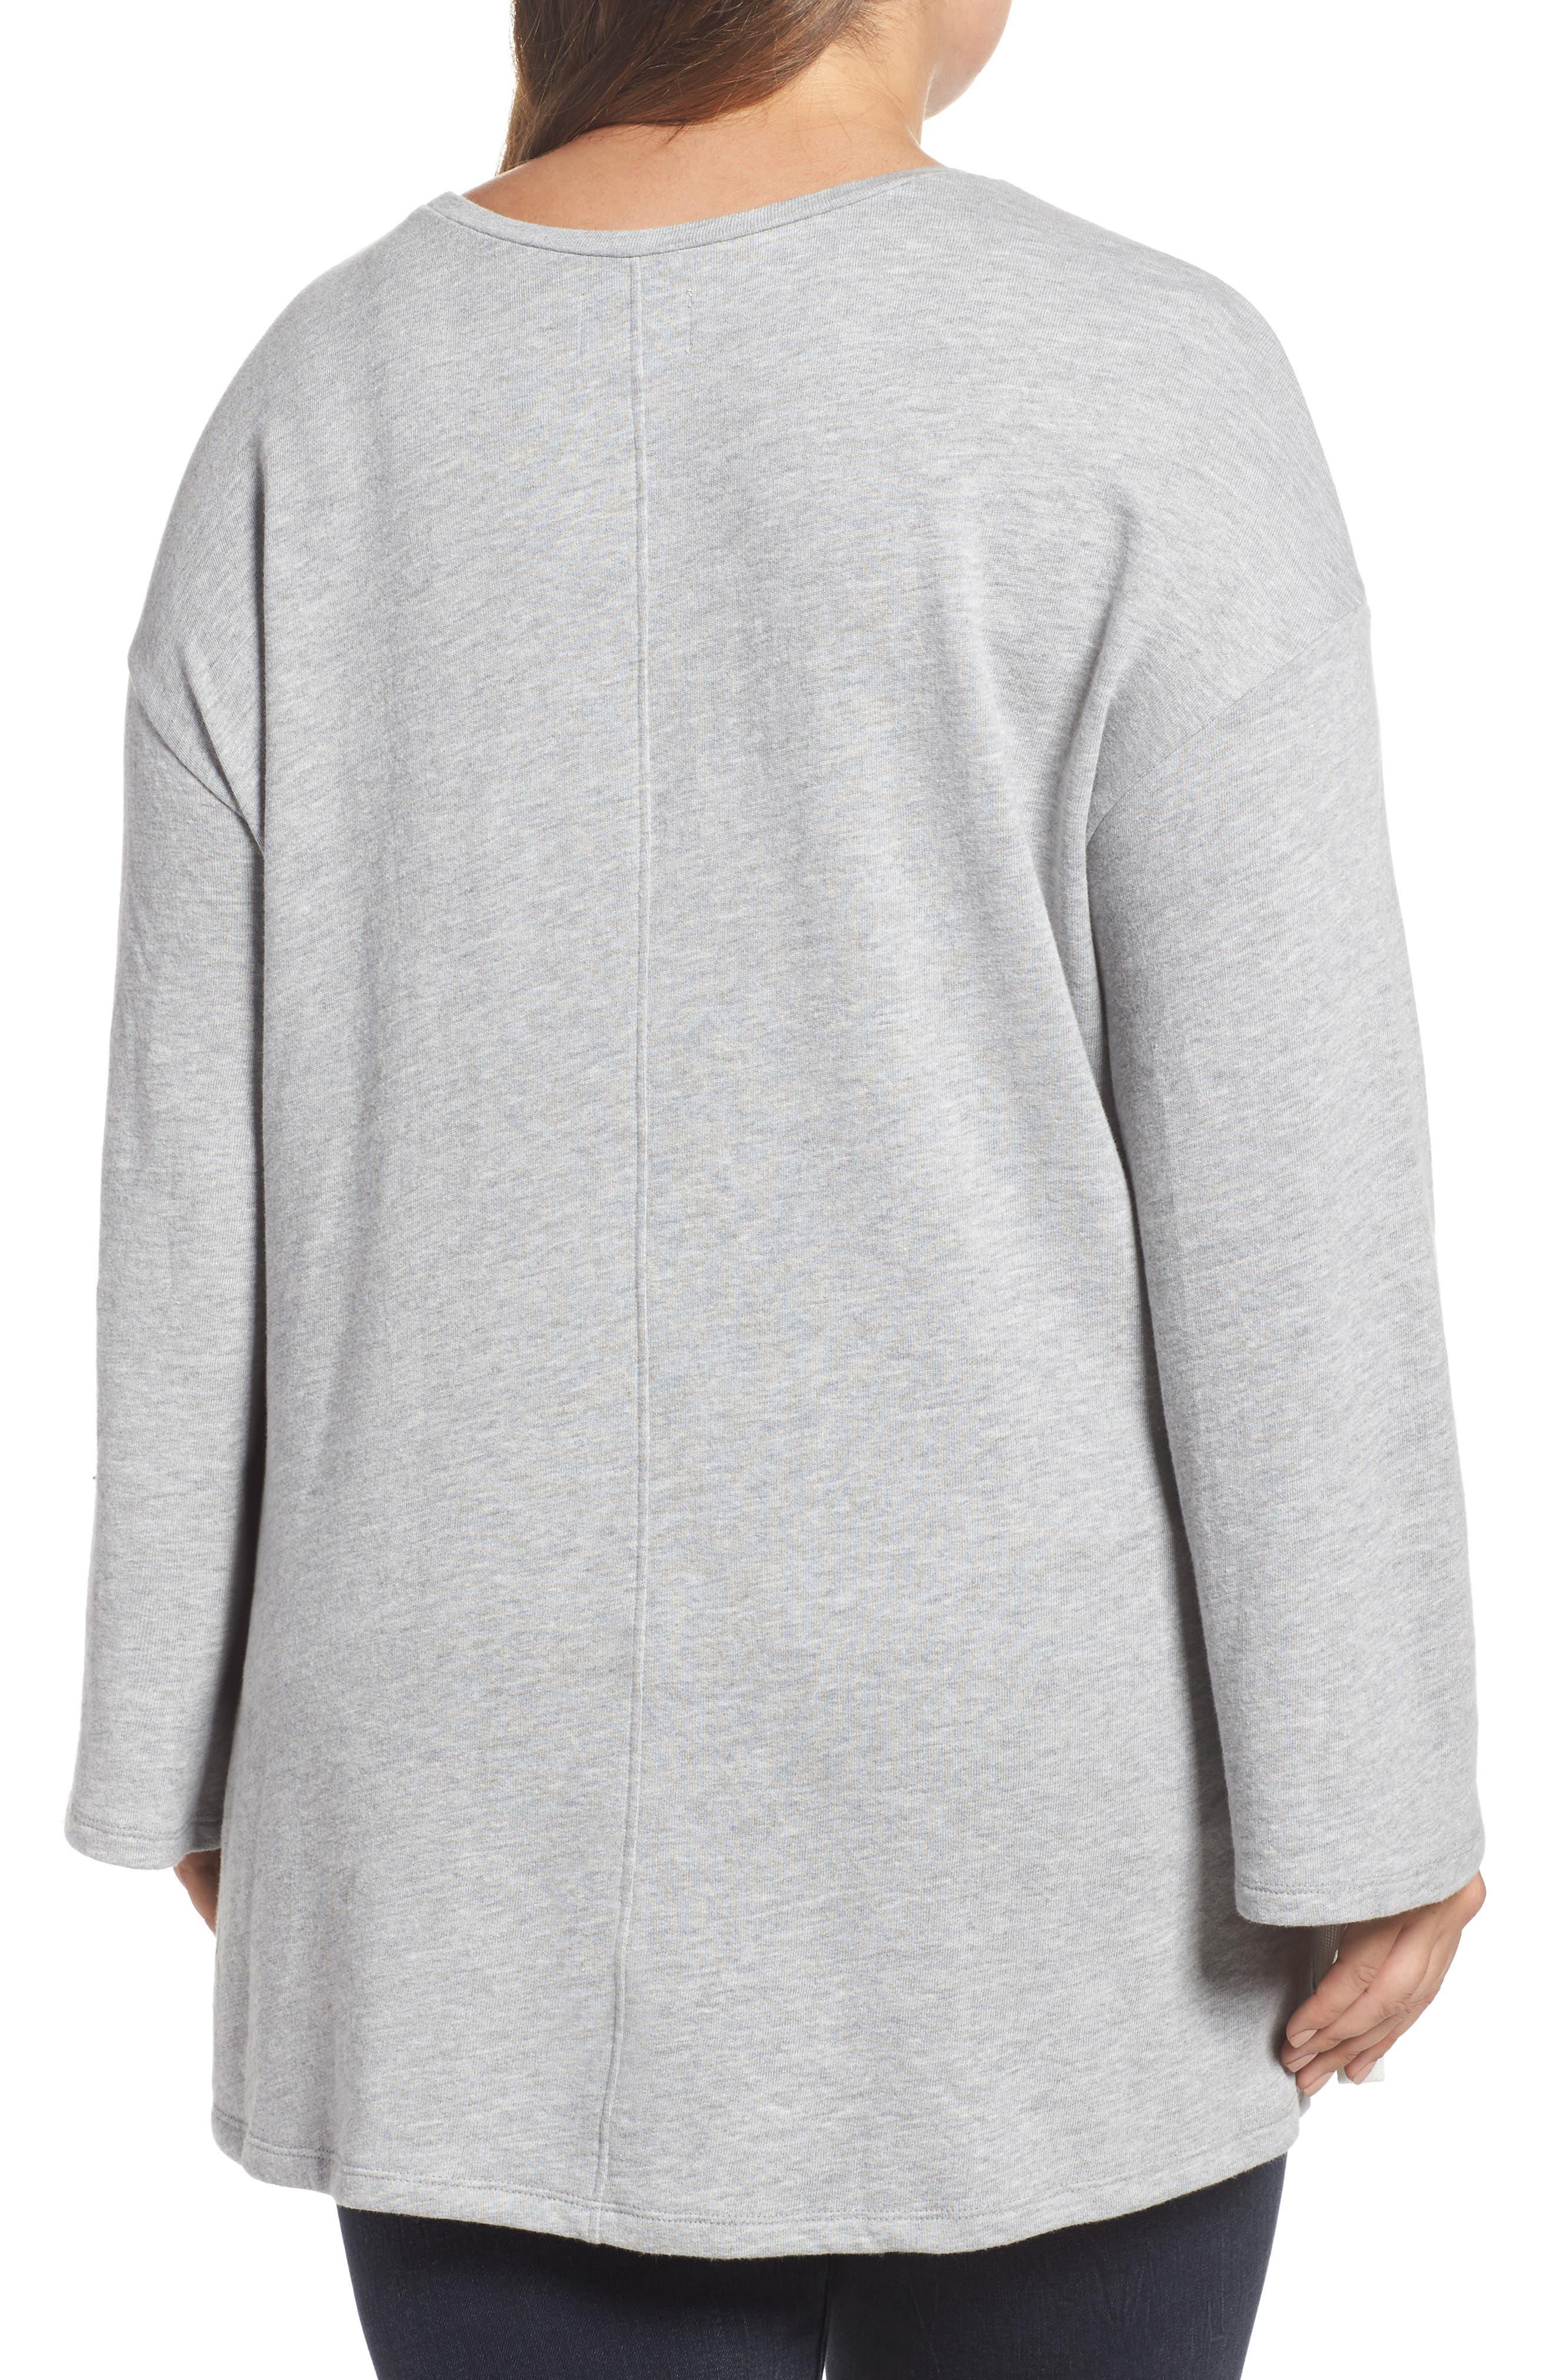 Lace-Up Side Sweatshirt,                             Alternate thumbnail 2, color,                             Grey Heather